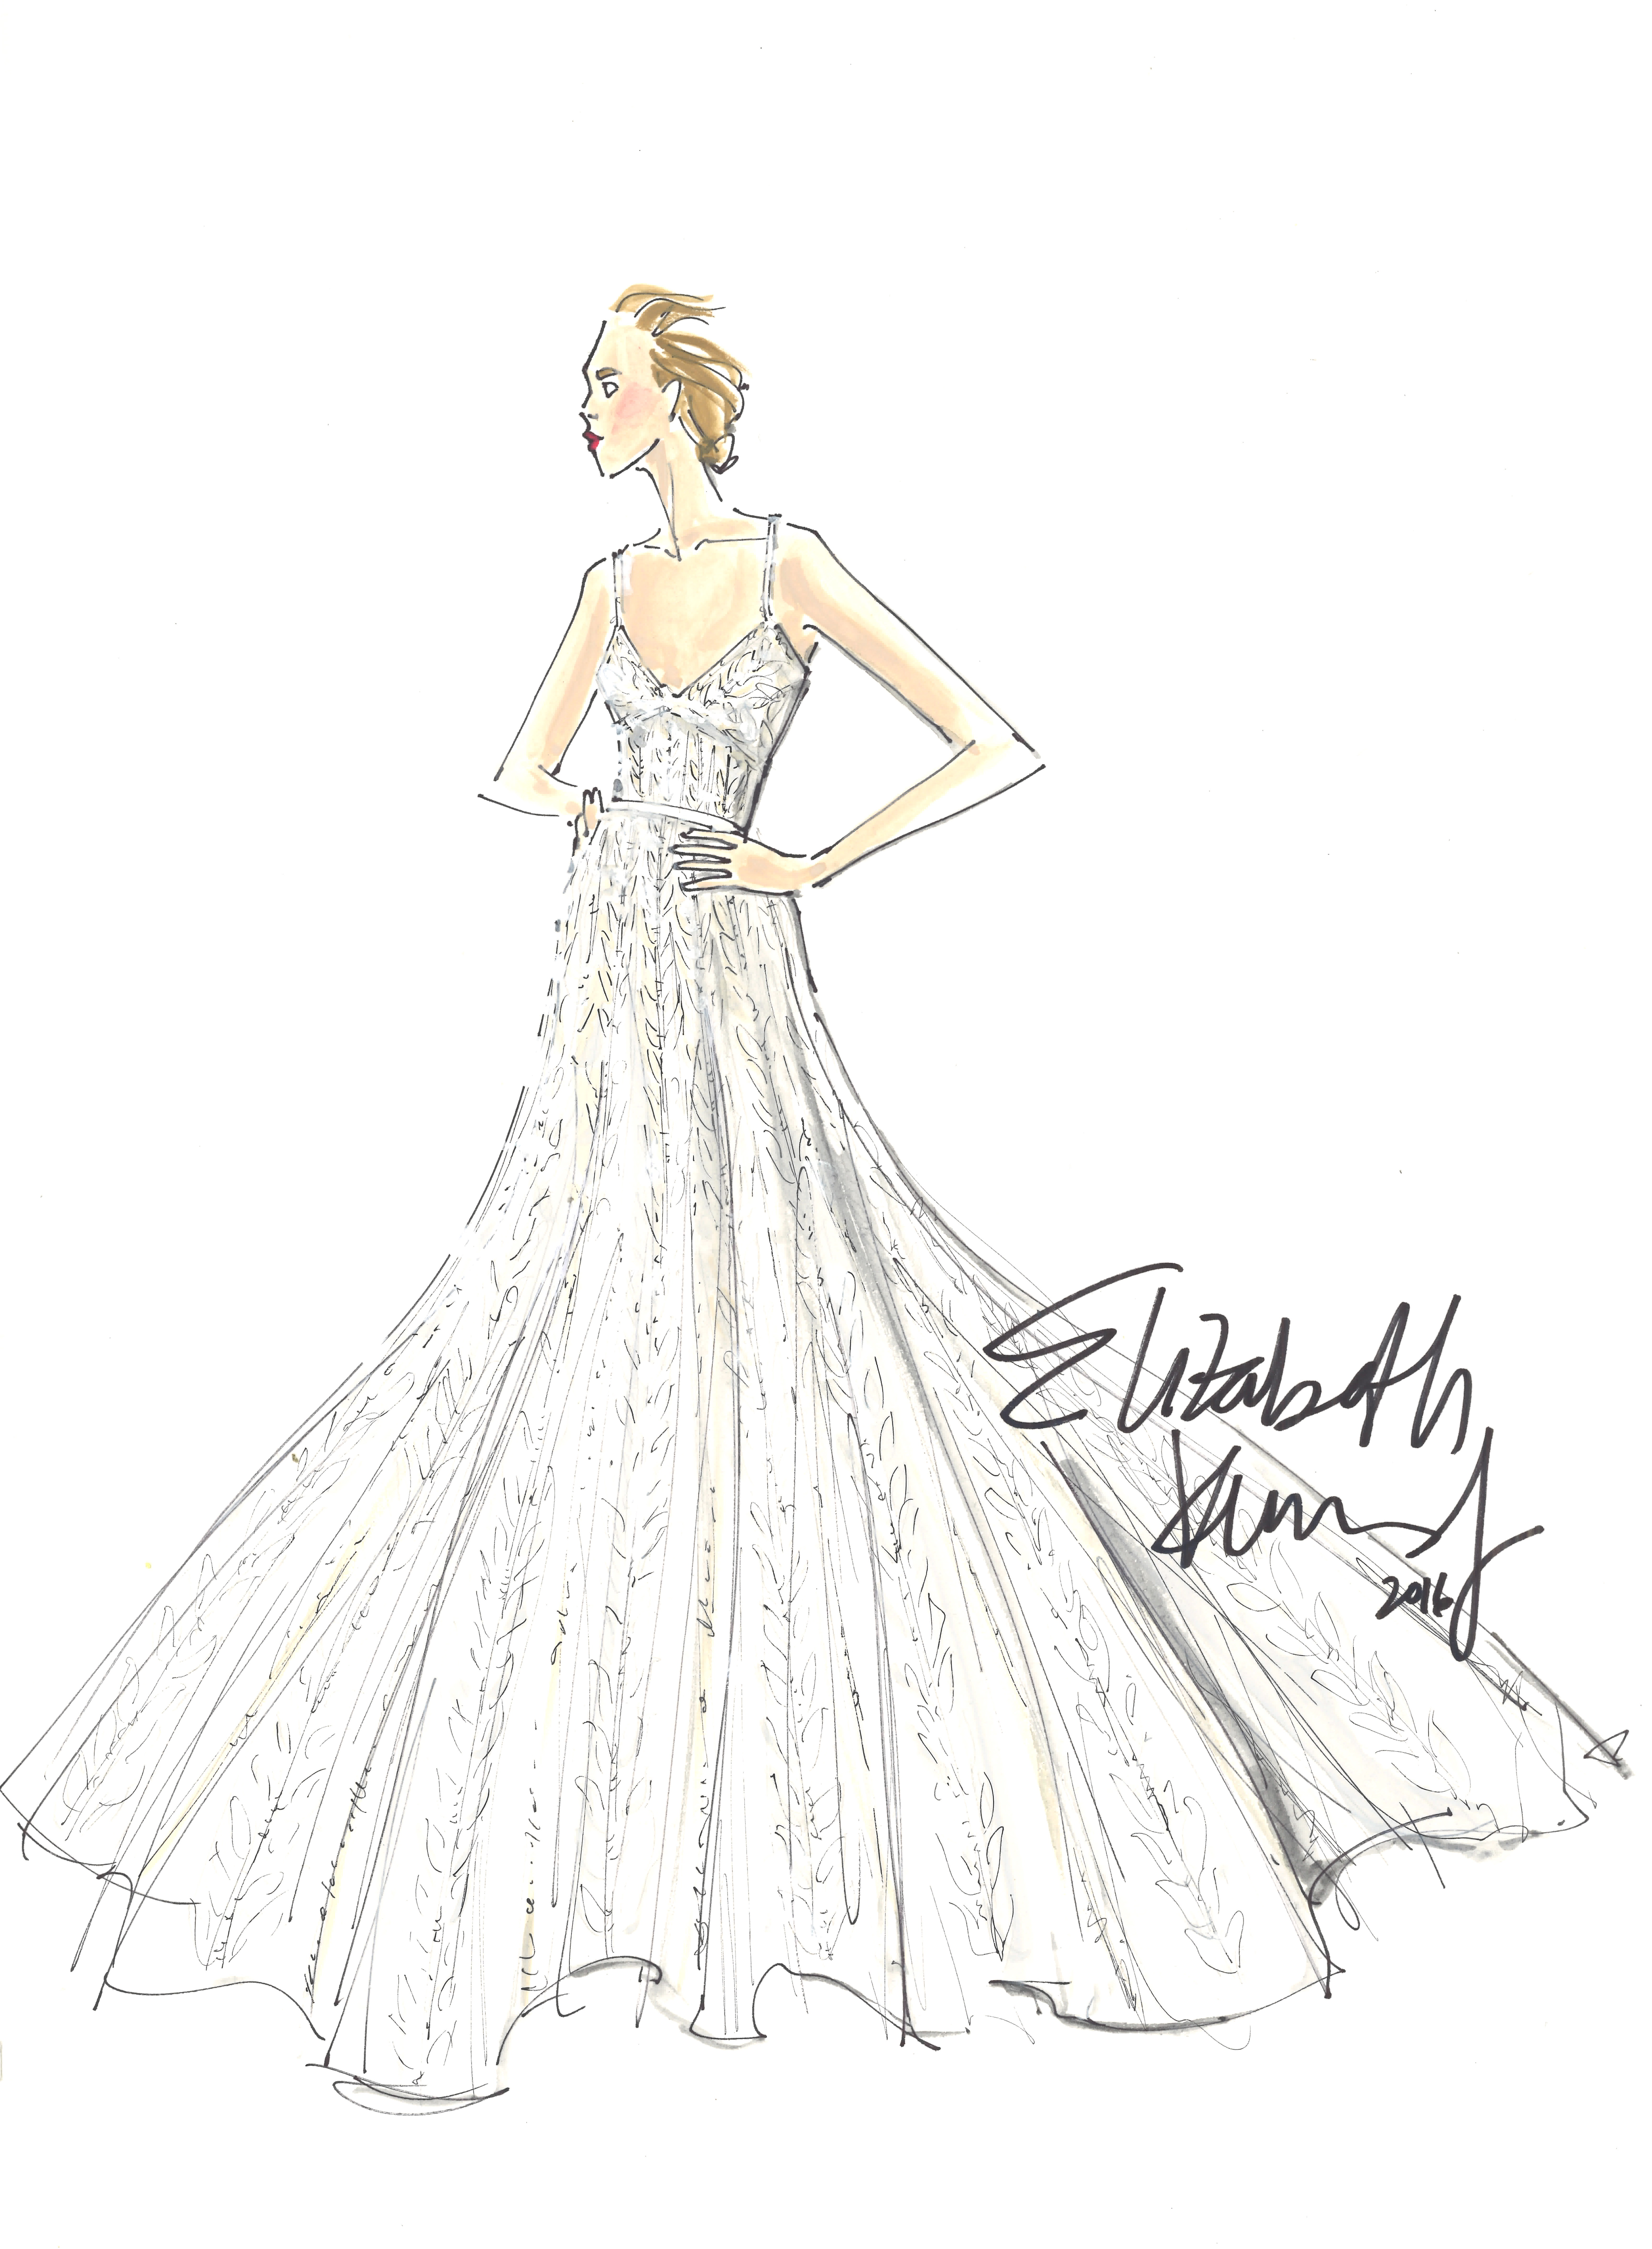 Elizabeth Kennedy sketch of her wedding dress design for Moda Operandi x Tiffany capsule collection